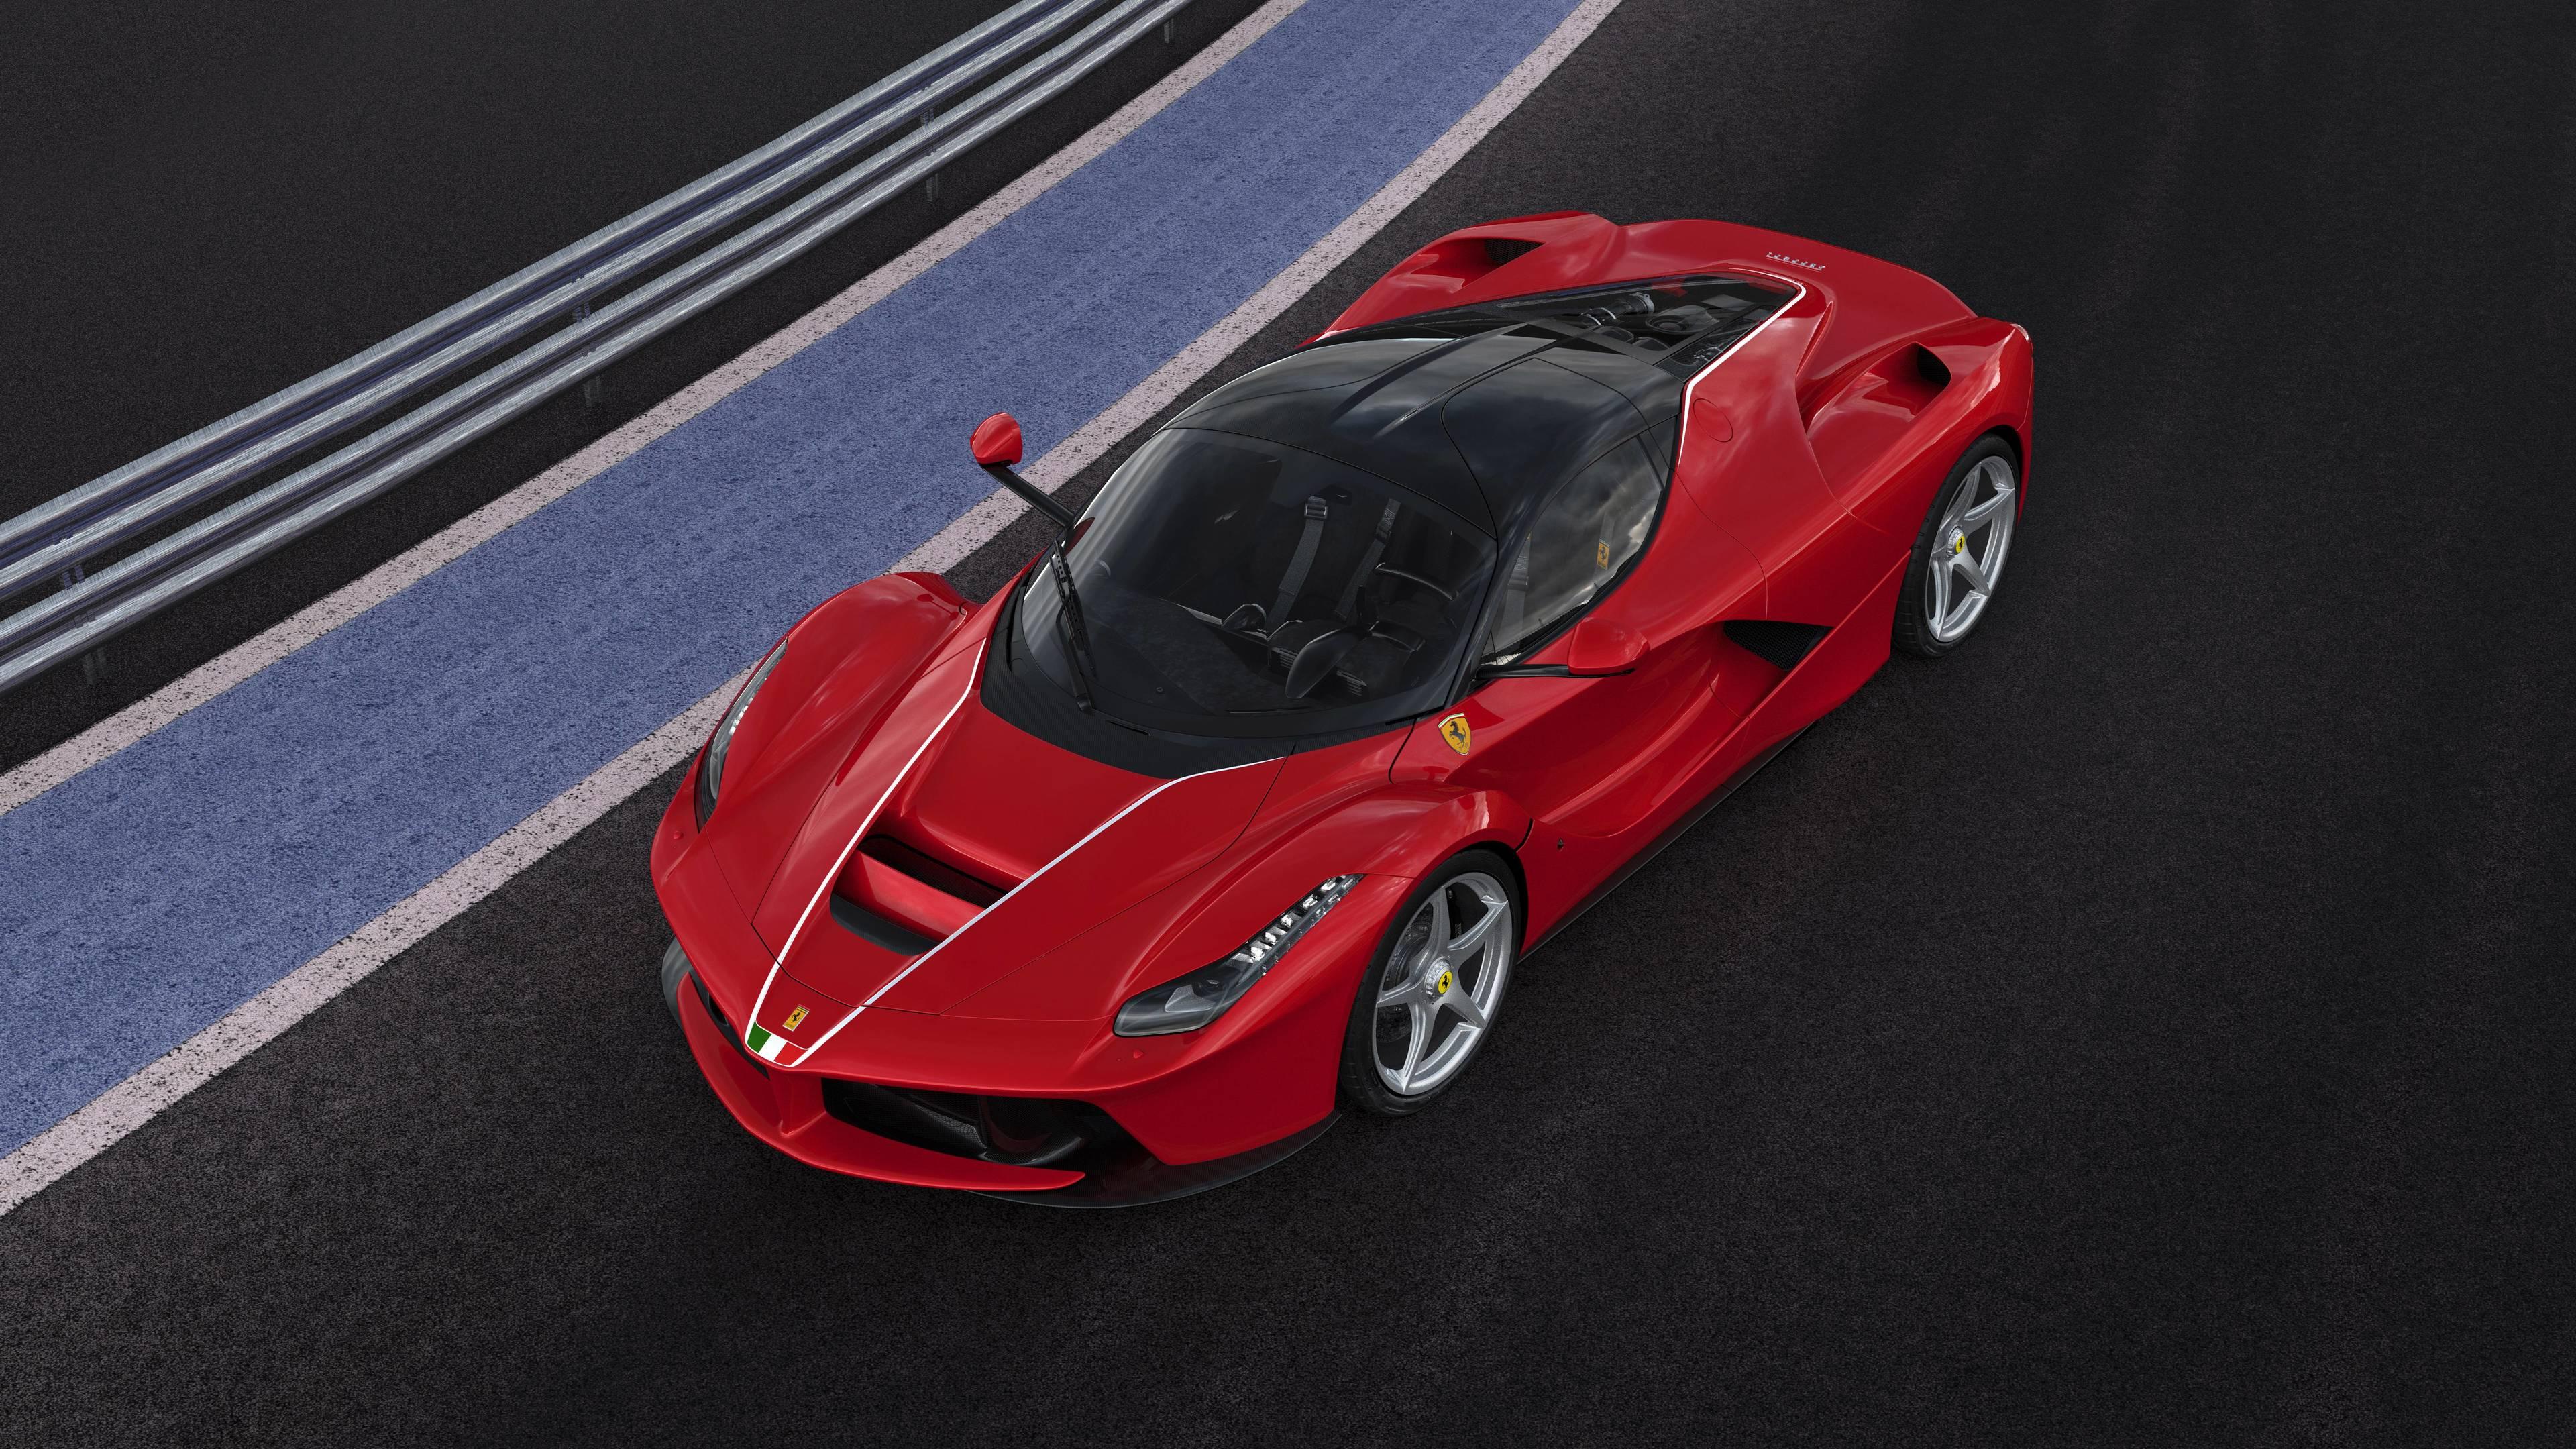 la ferrari 8k 1539104883 - La Ferrari 8k - red wallpapers, hd-wallpapers, ferrari wallpapers, cars wallpapers, 8k wallpapers, 4k-wallpapers